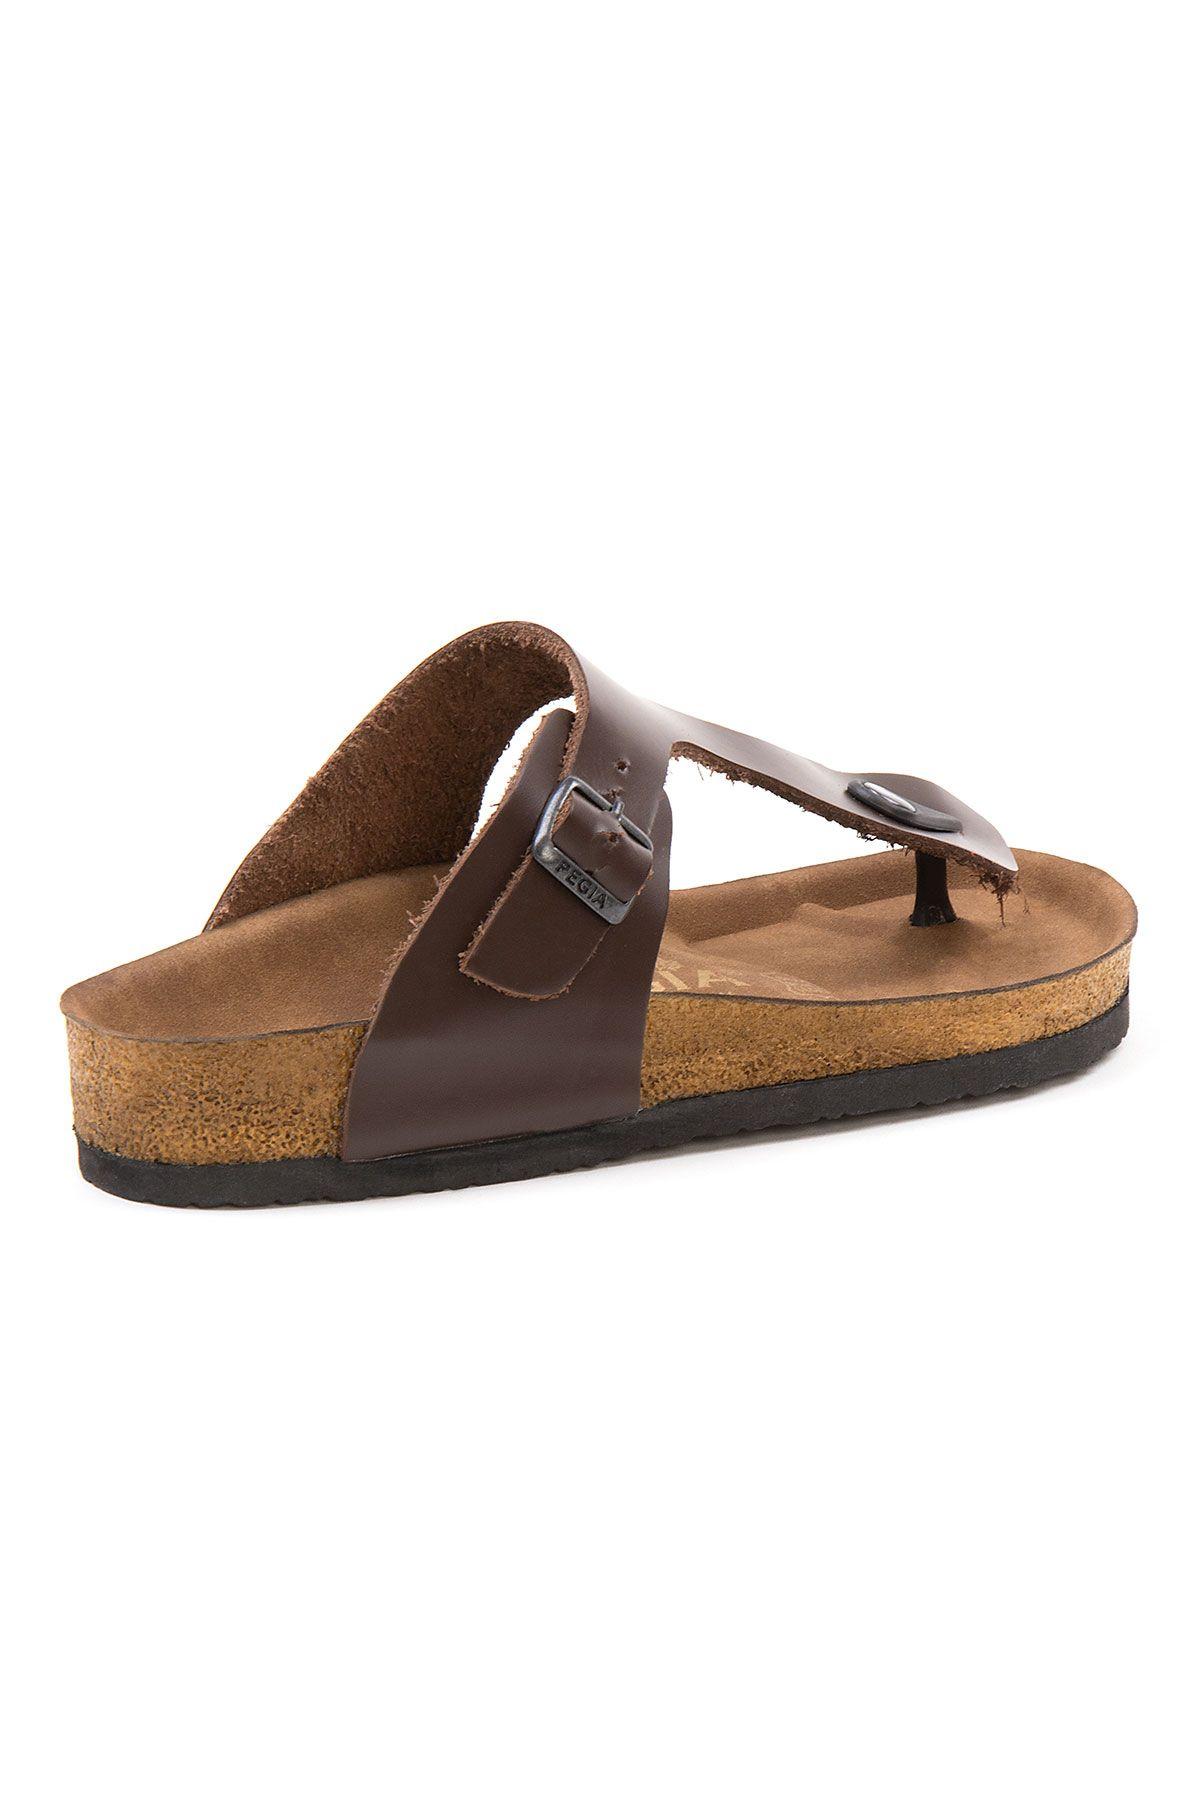 Pegia Women's Leather Flip Flops 215526 Brown